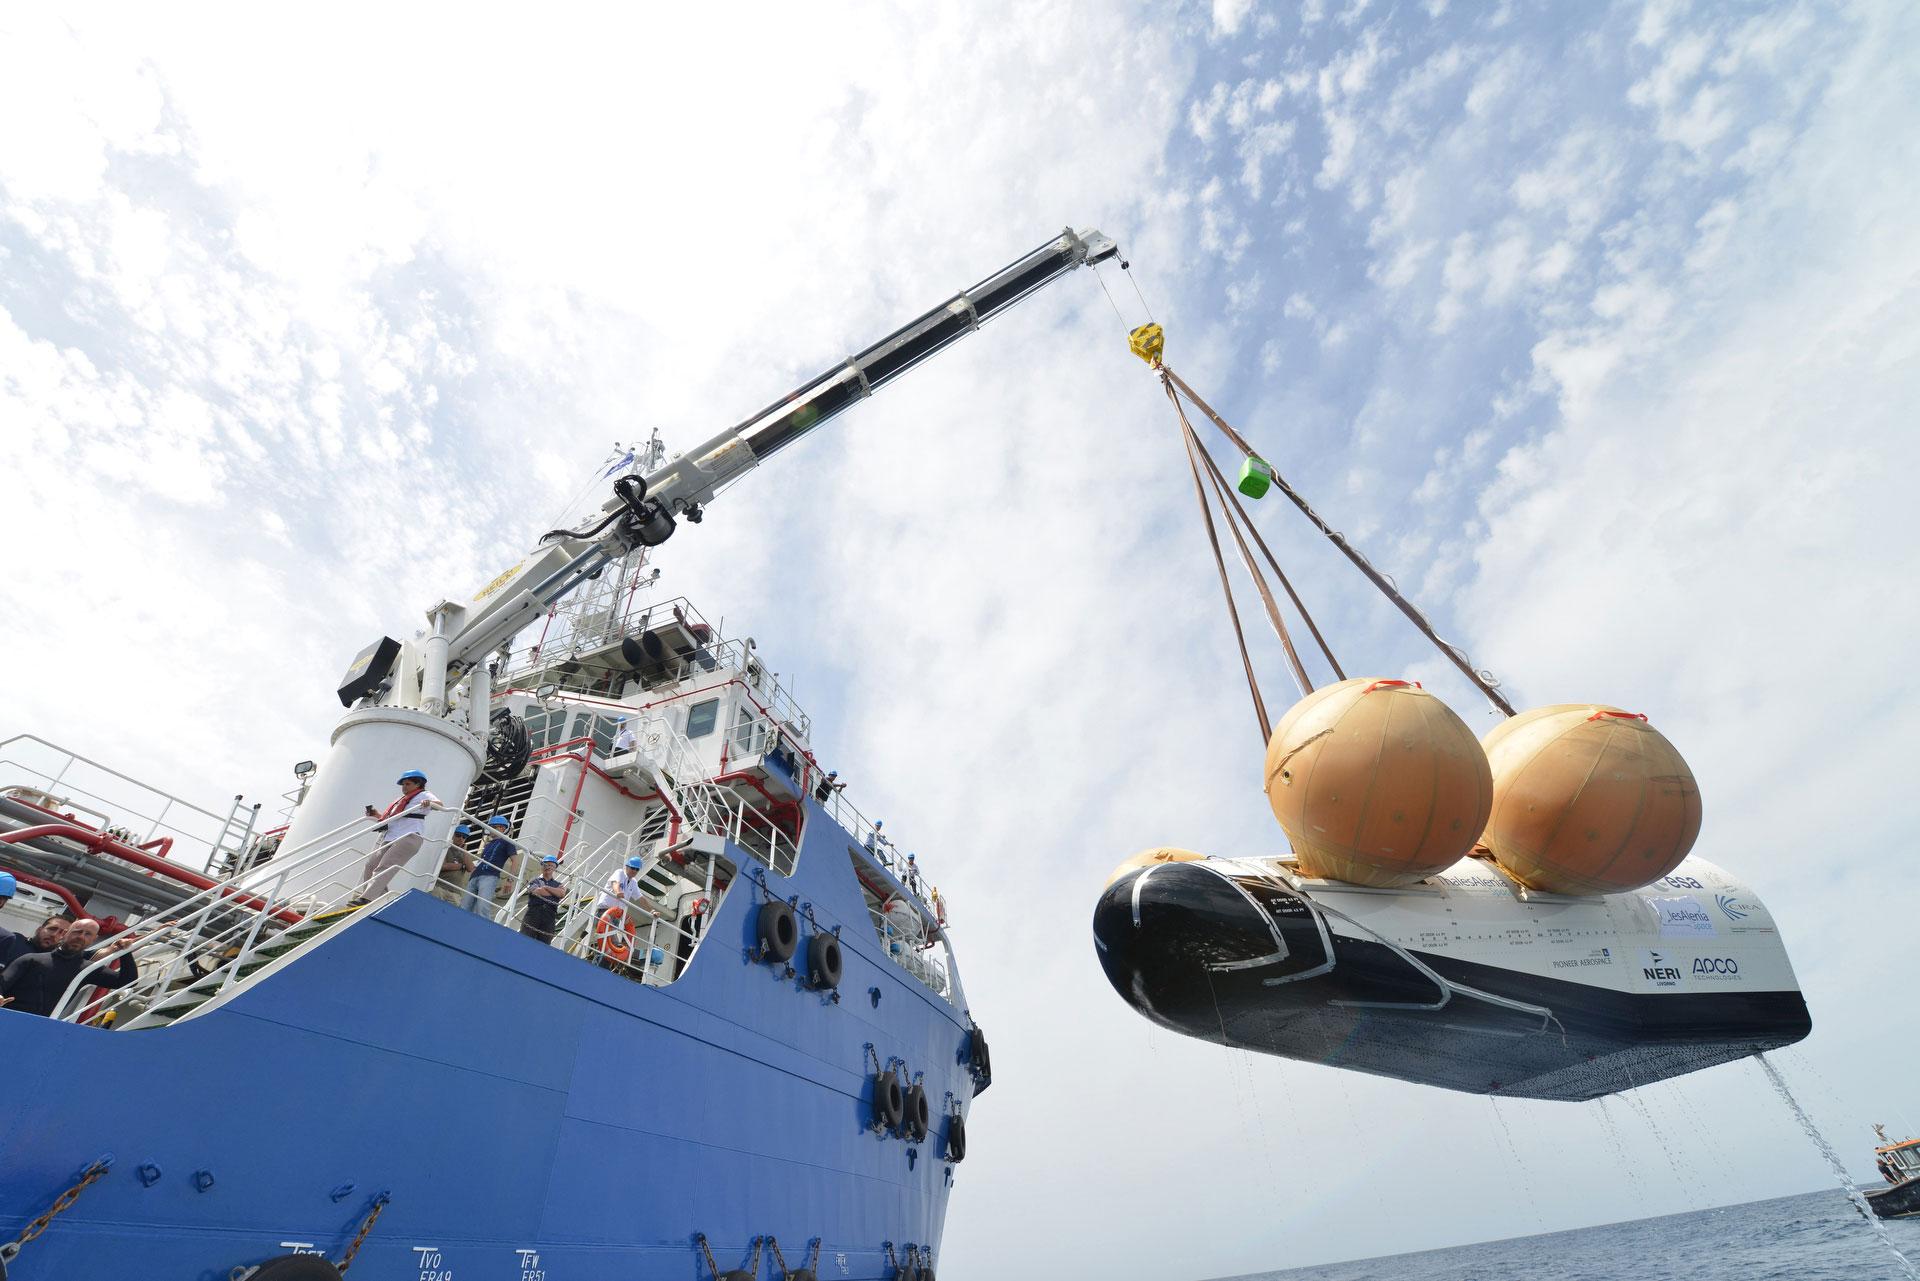 IXV prototype hoisted onto ship. Credit: Neri - Livorno (I)